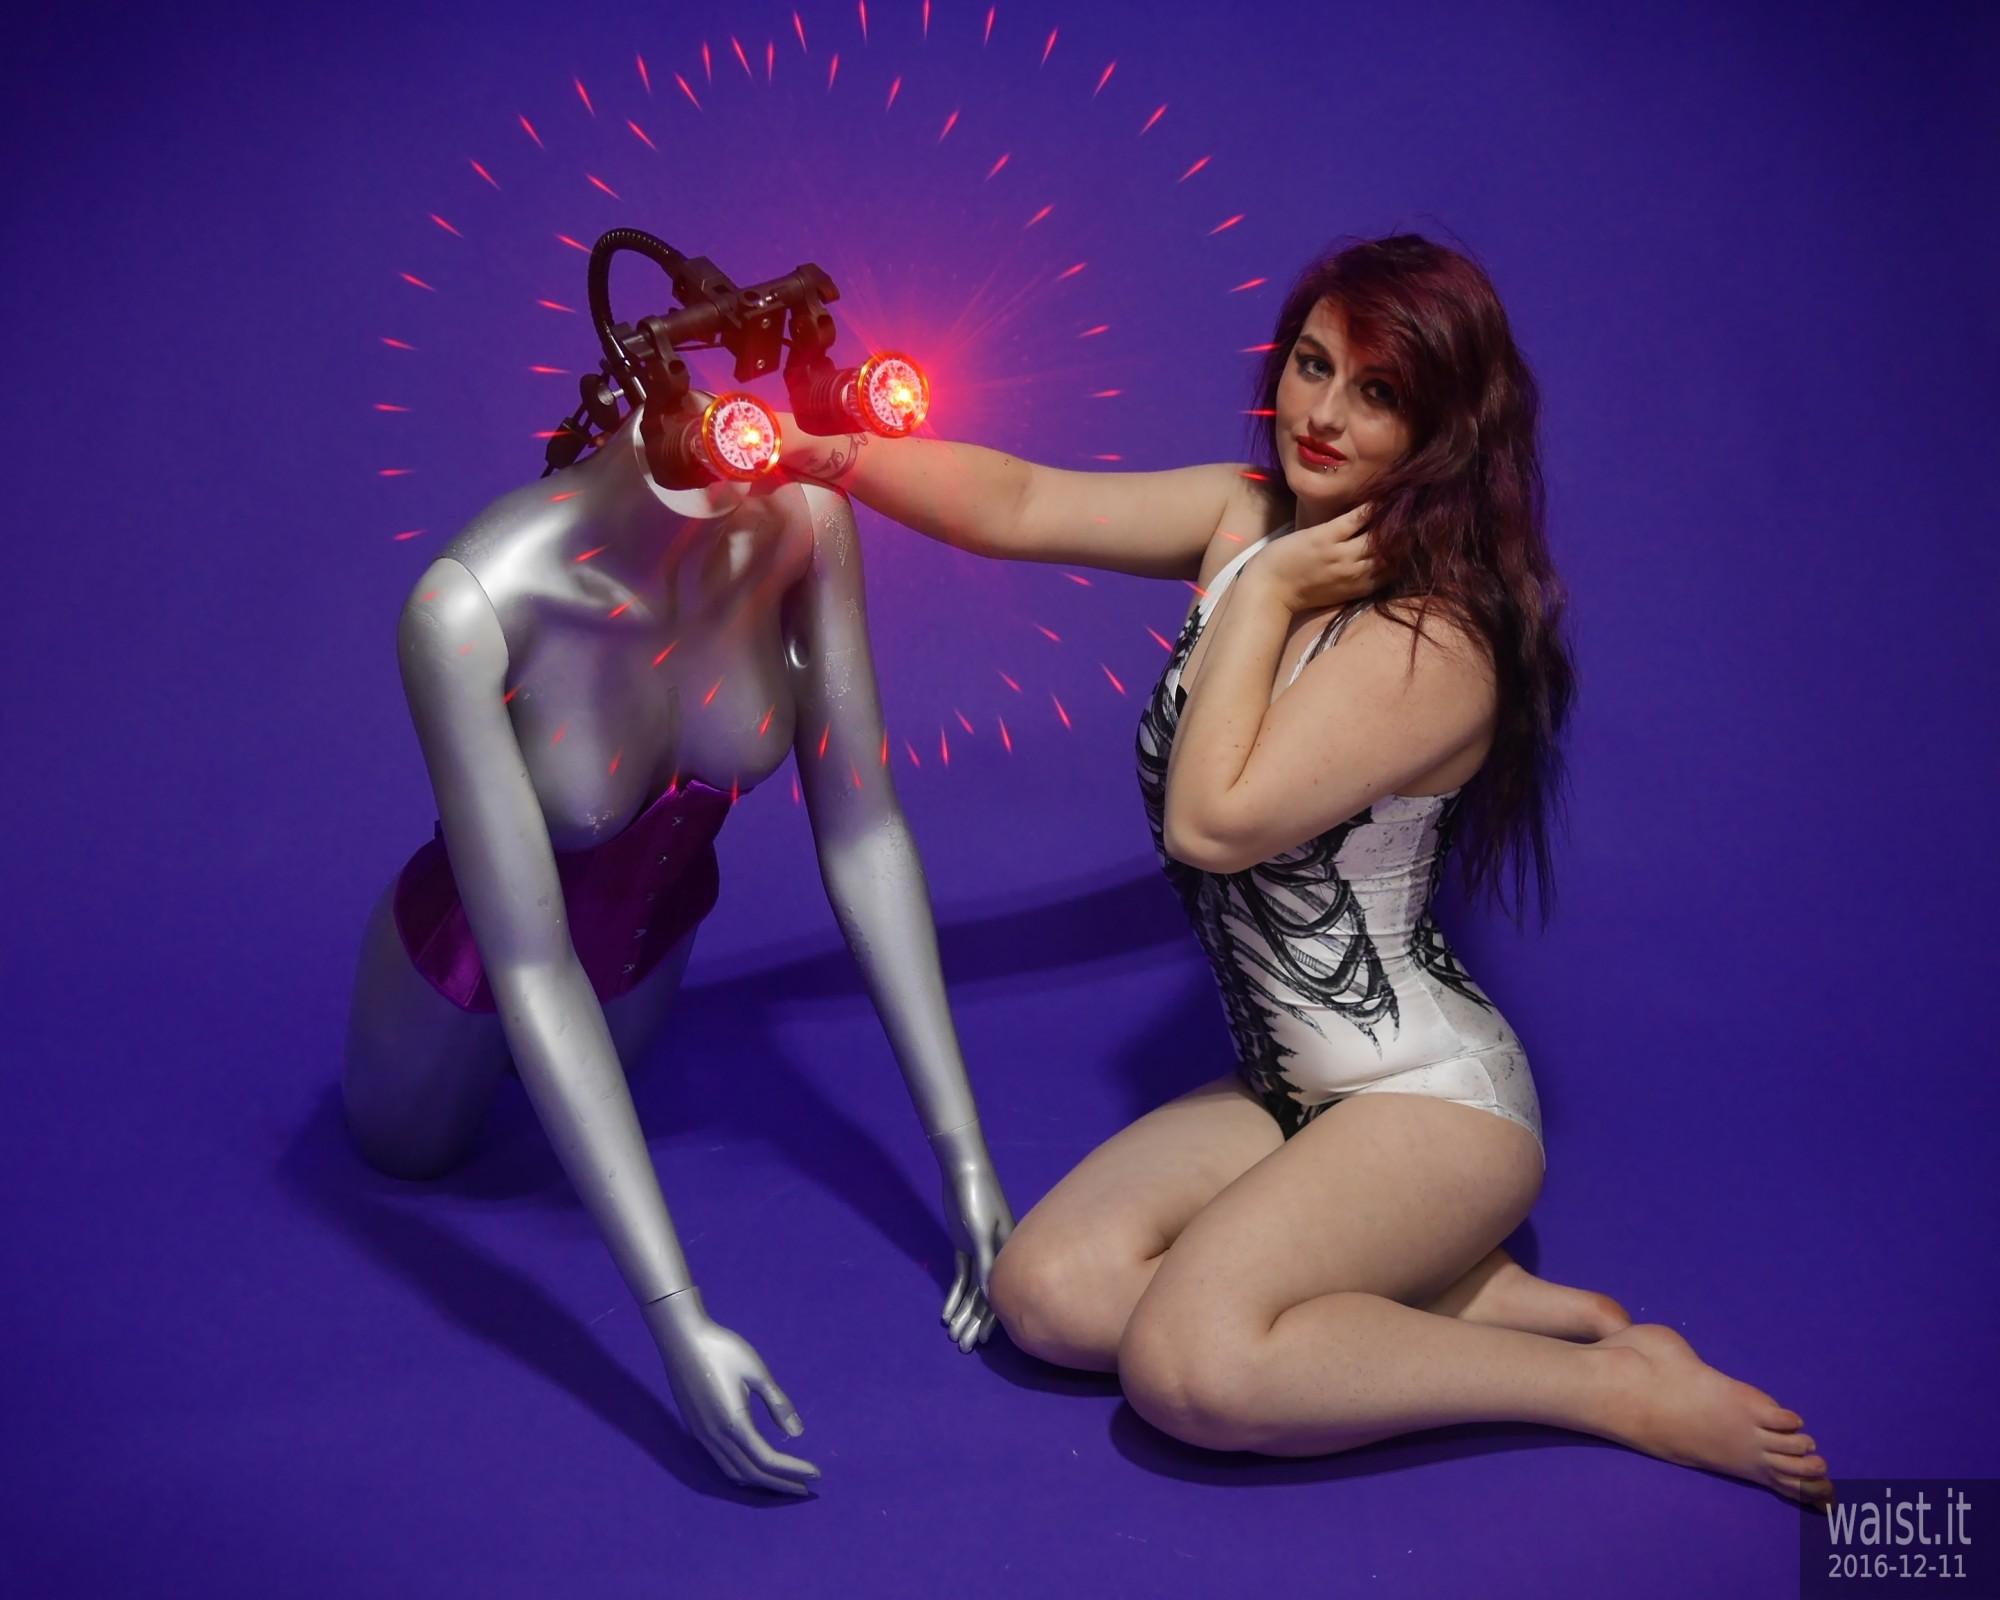 2019-12-11 Miss Danni Lou in R2D2 swimsuit, with LED-lit broken mannequin